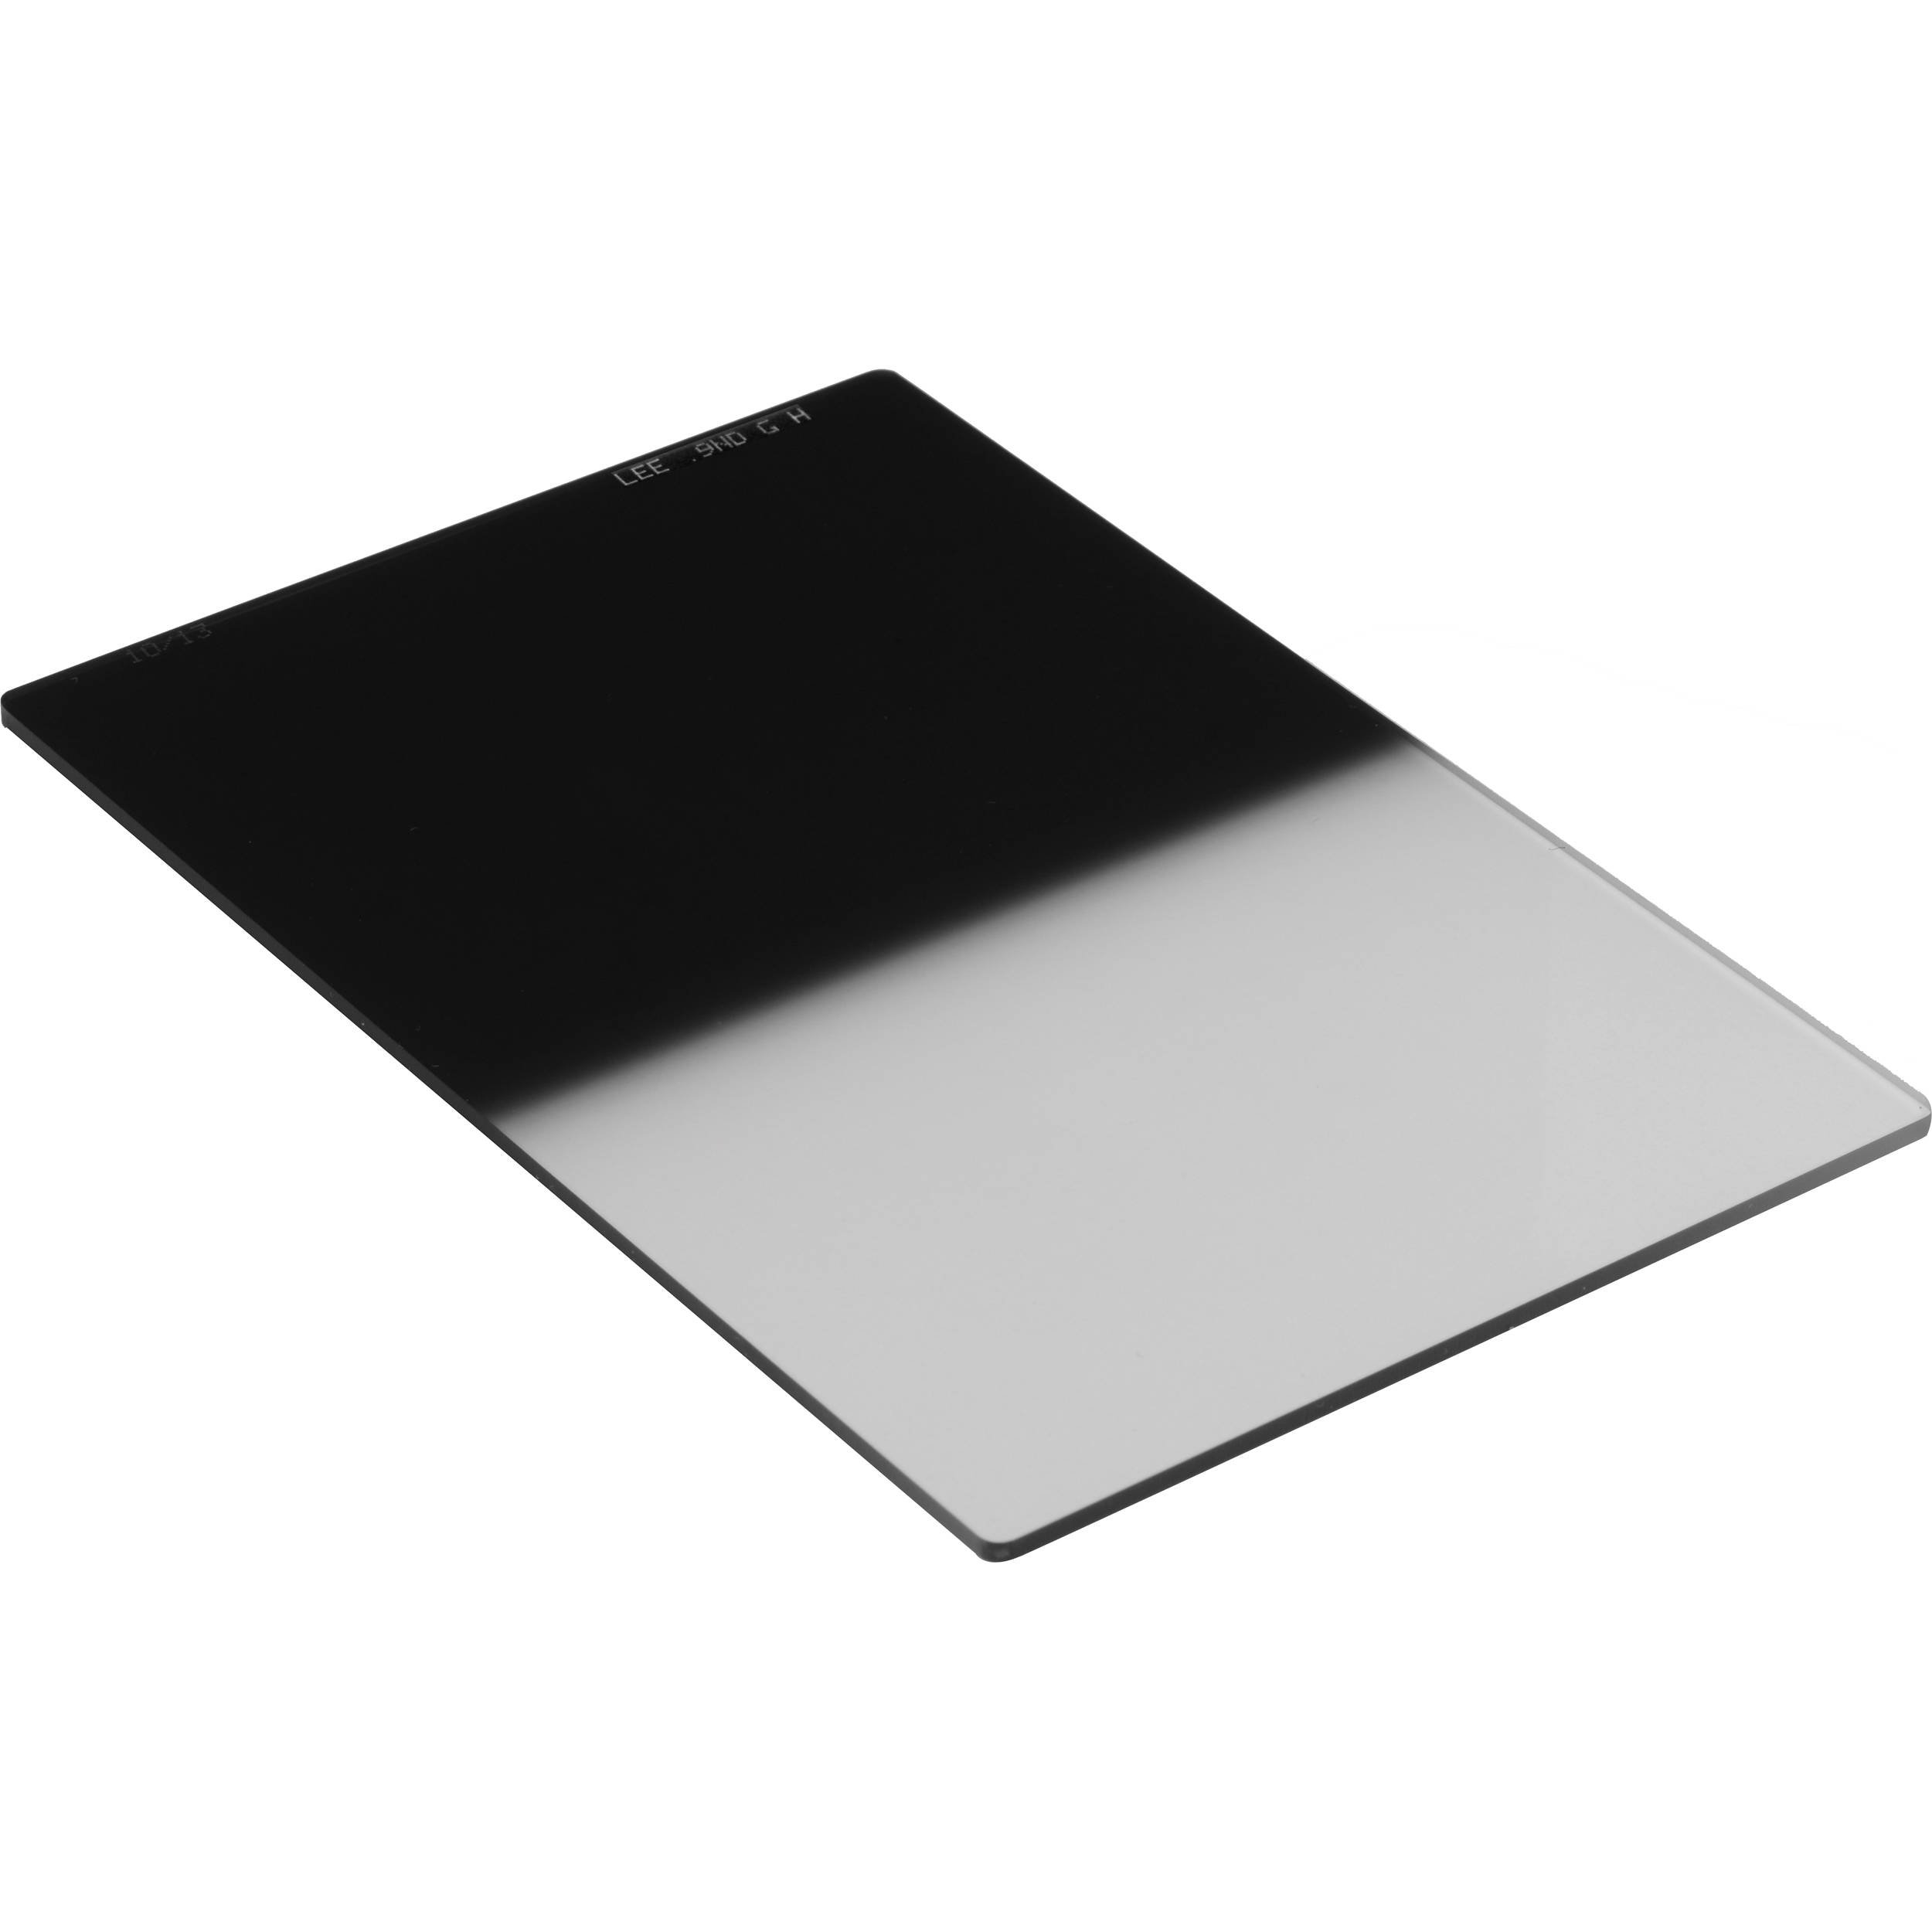 LEE filtr SW150 ND 0,9 šedý 150x170 gradual Hard